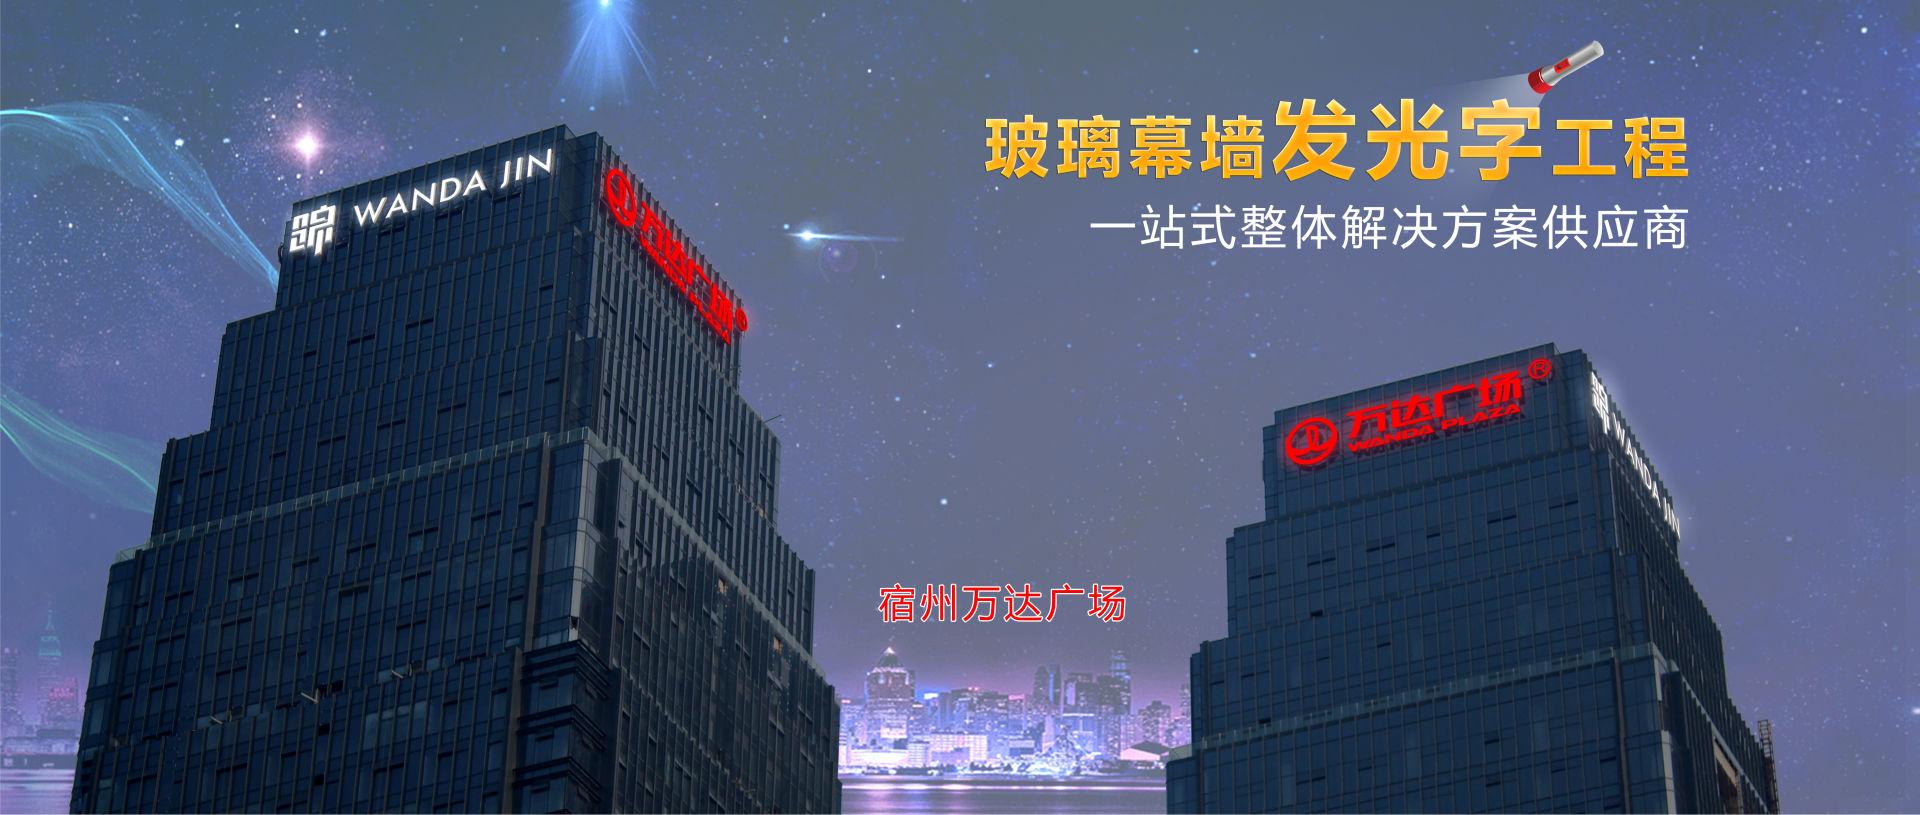 LFC升龙集团楼体LOGO标识发光字工程